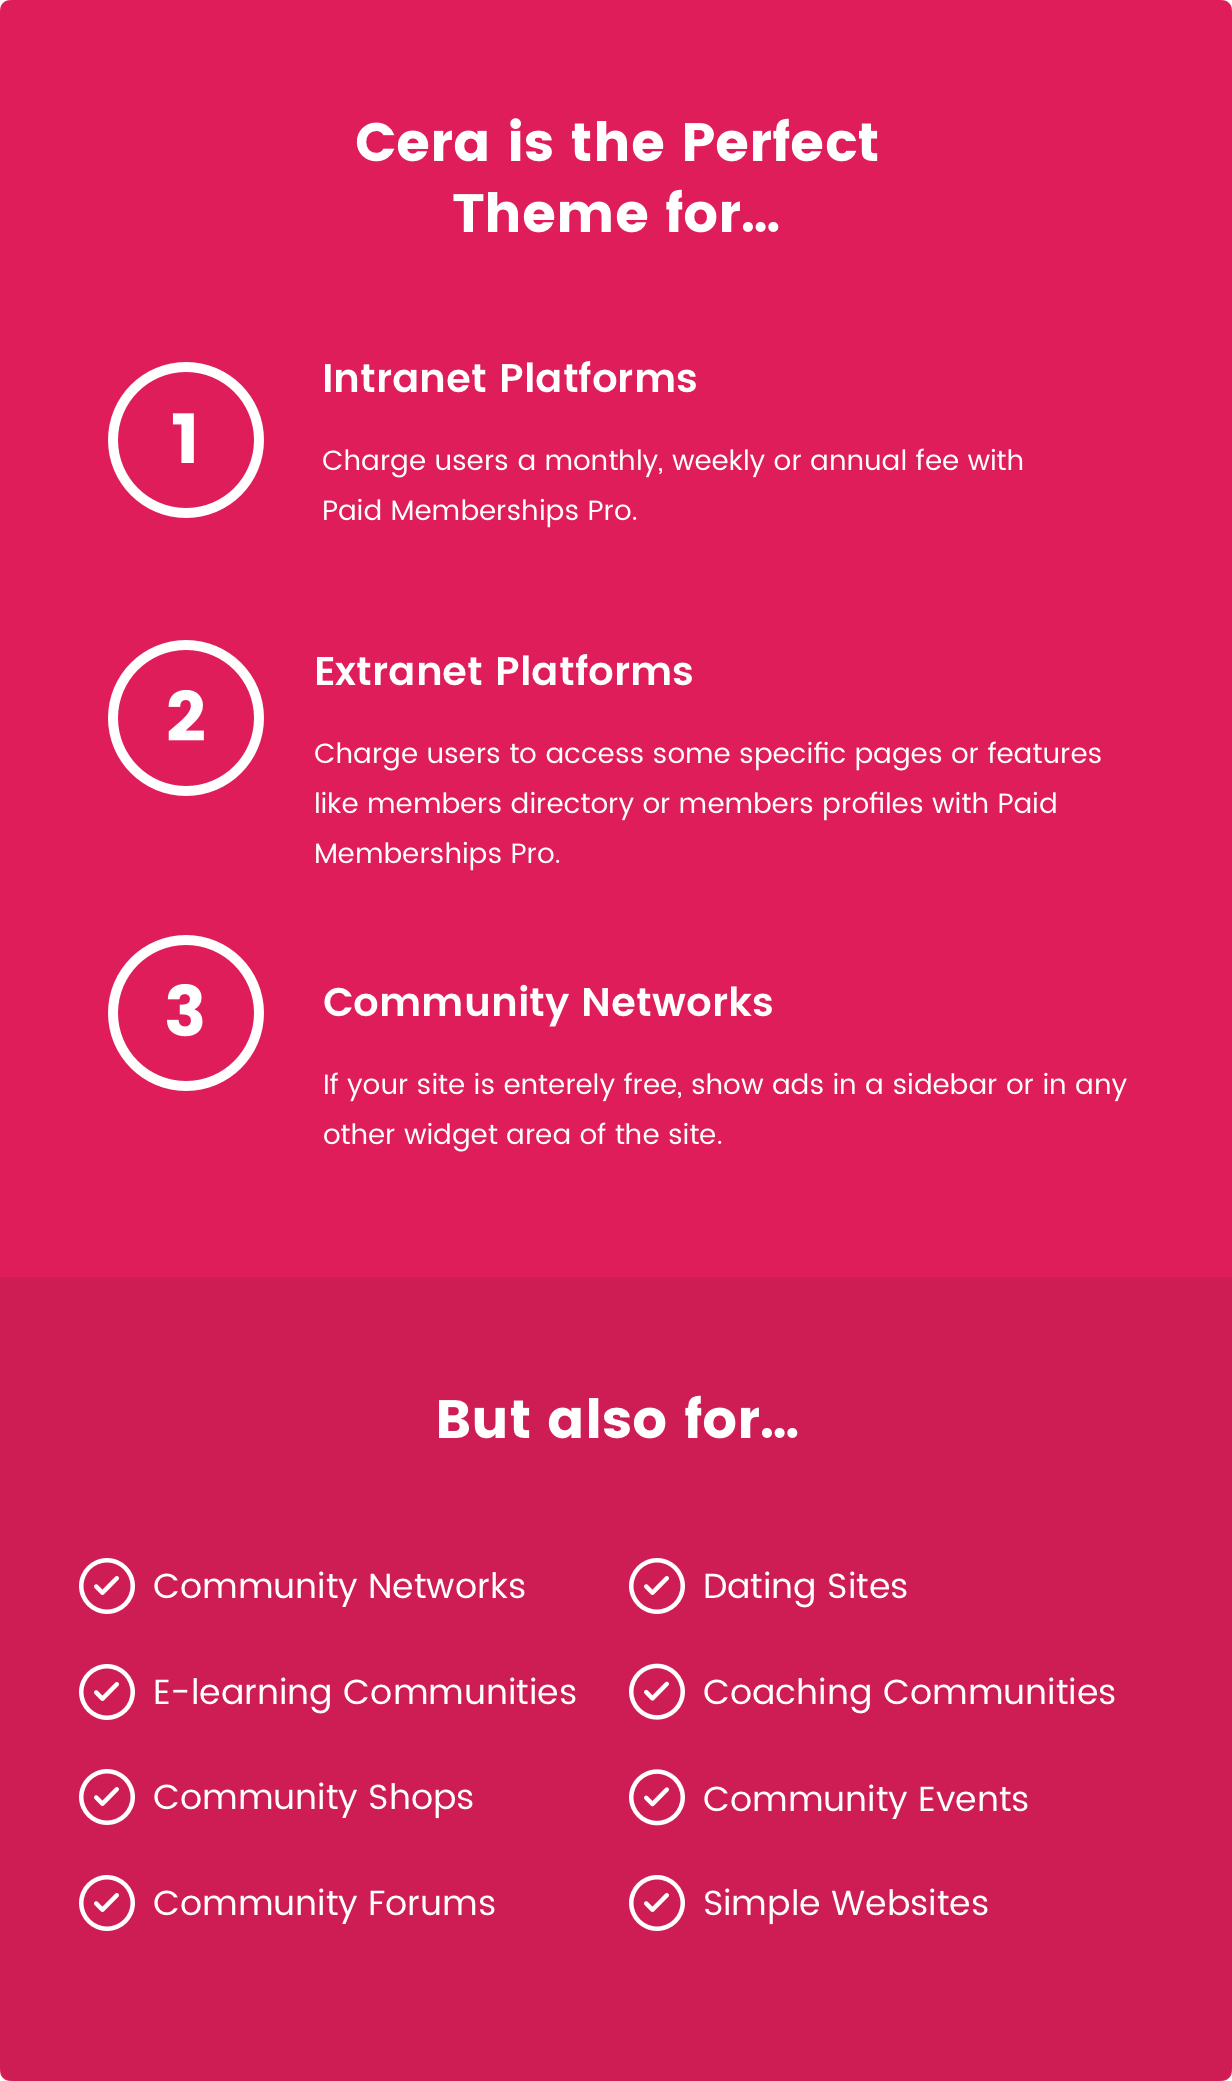 Cera - Pro Intranet/Extranet Social Network & BuddyPress Community Theme - 6